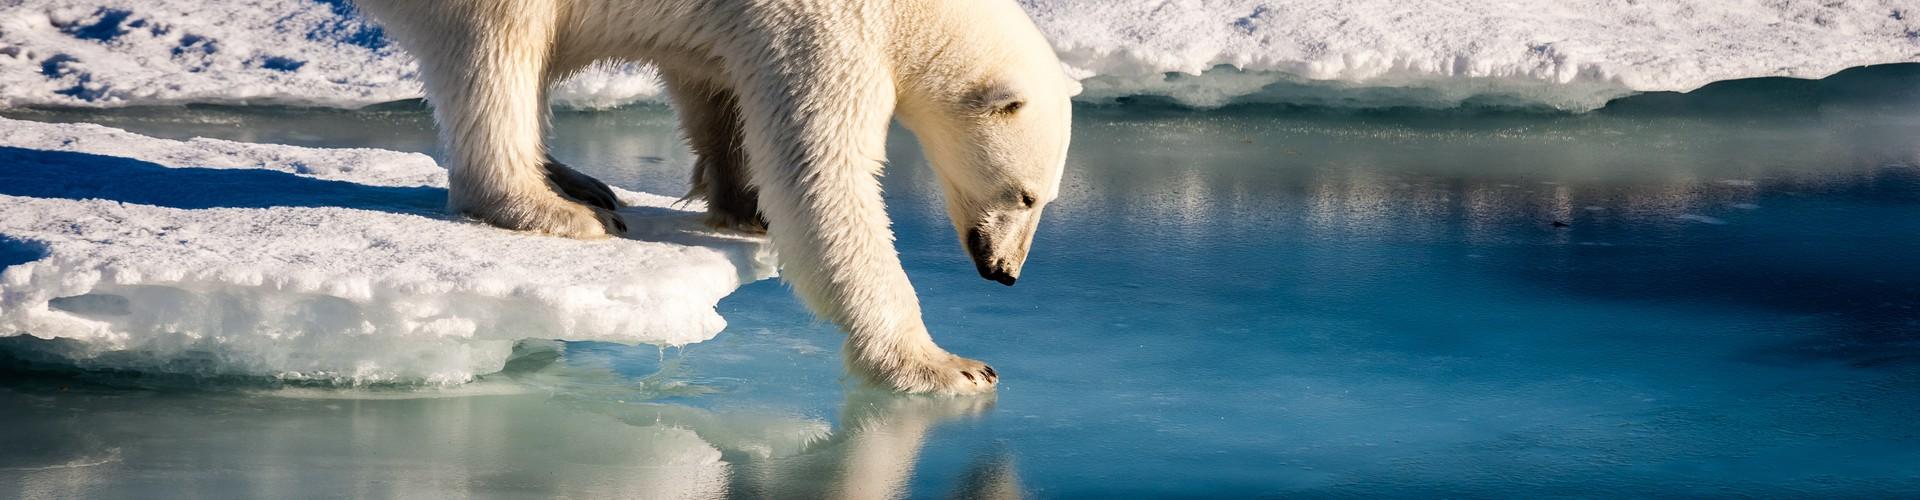 Polar bear tests the strength of thin sea ice in the Arctic (Credit: Mario Hoppmann, via imaggeo.egu.eu)